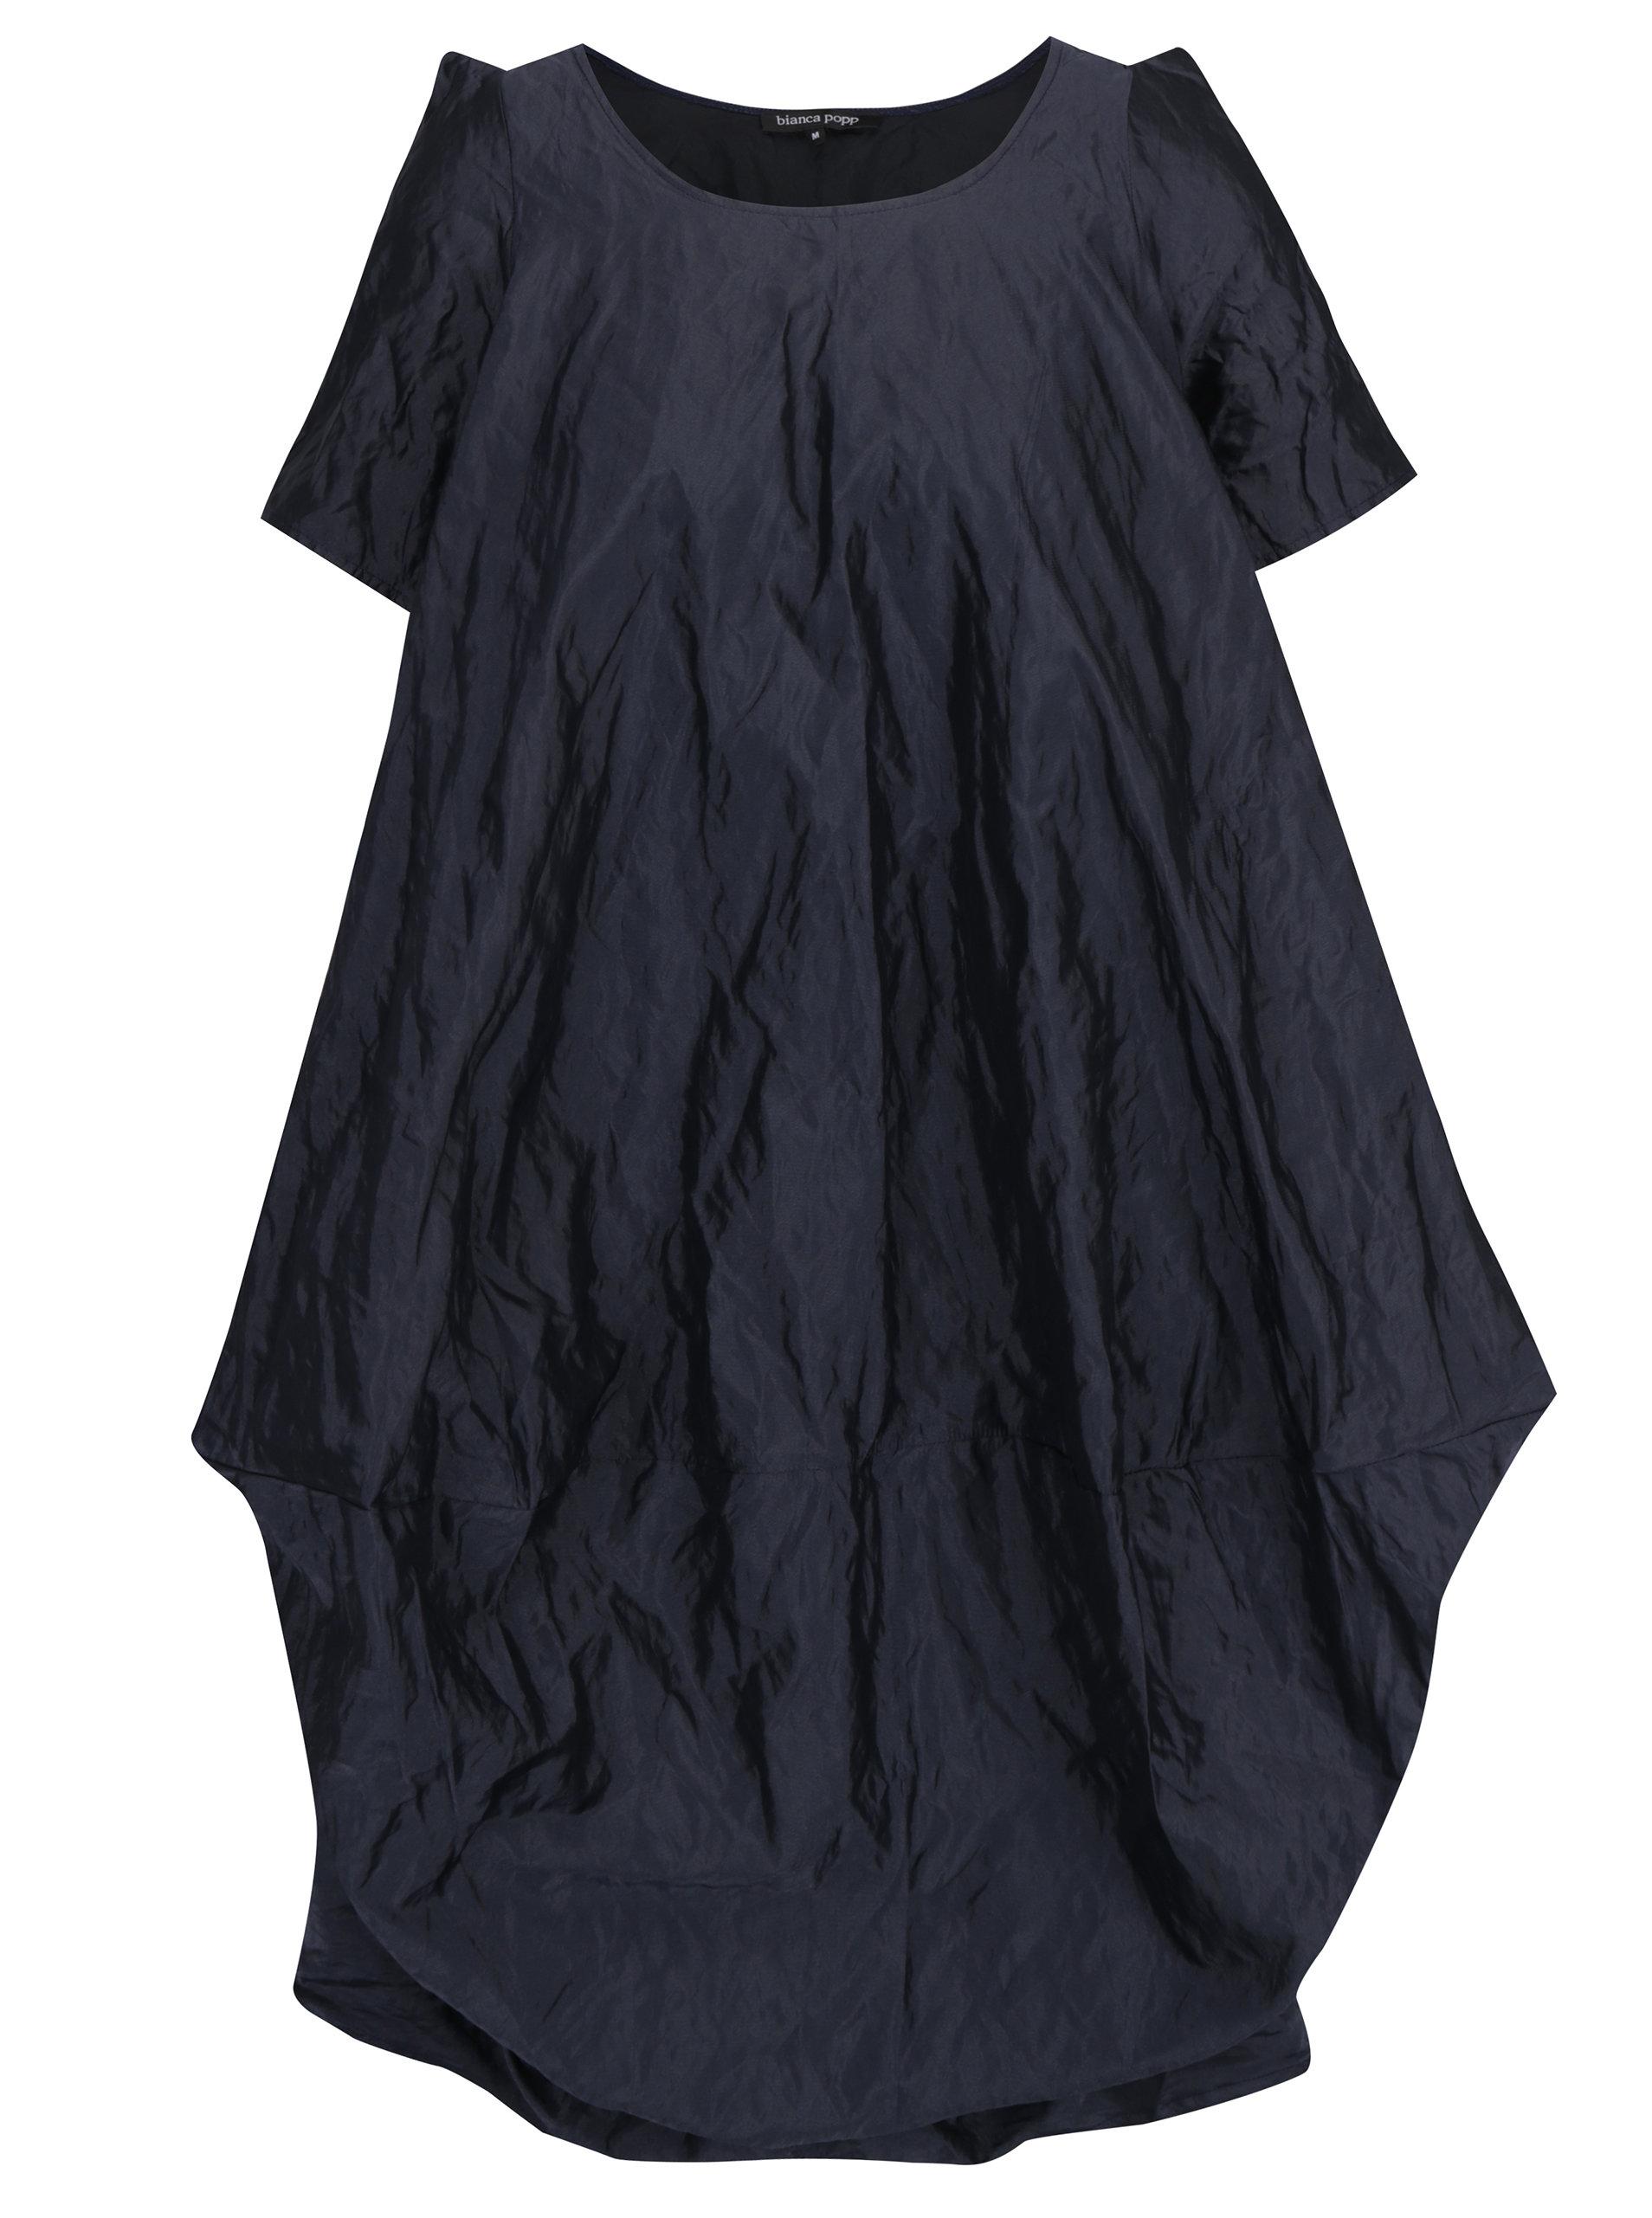 6b03a5b72c1f Tmavě modré třpytivé balónové šaty s kapsami Bianca Popp ...